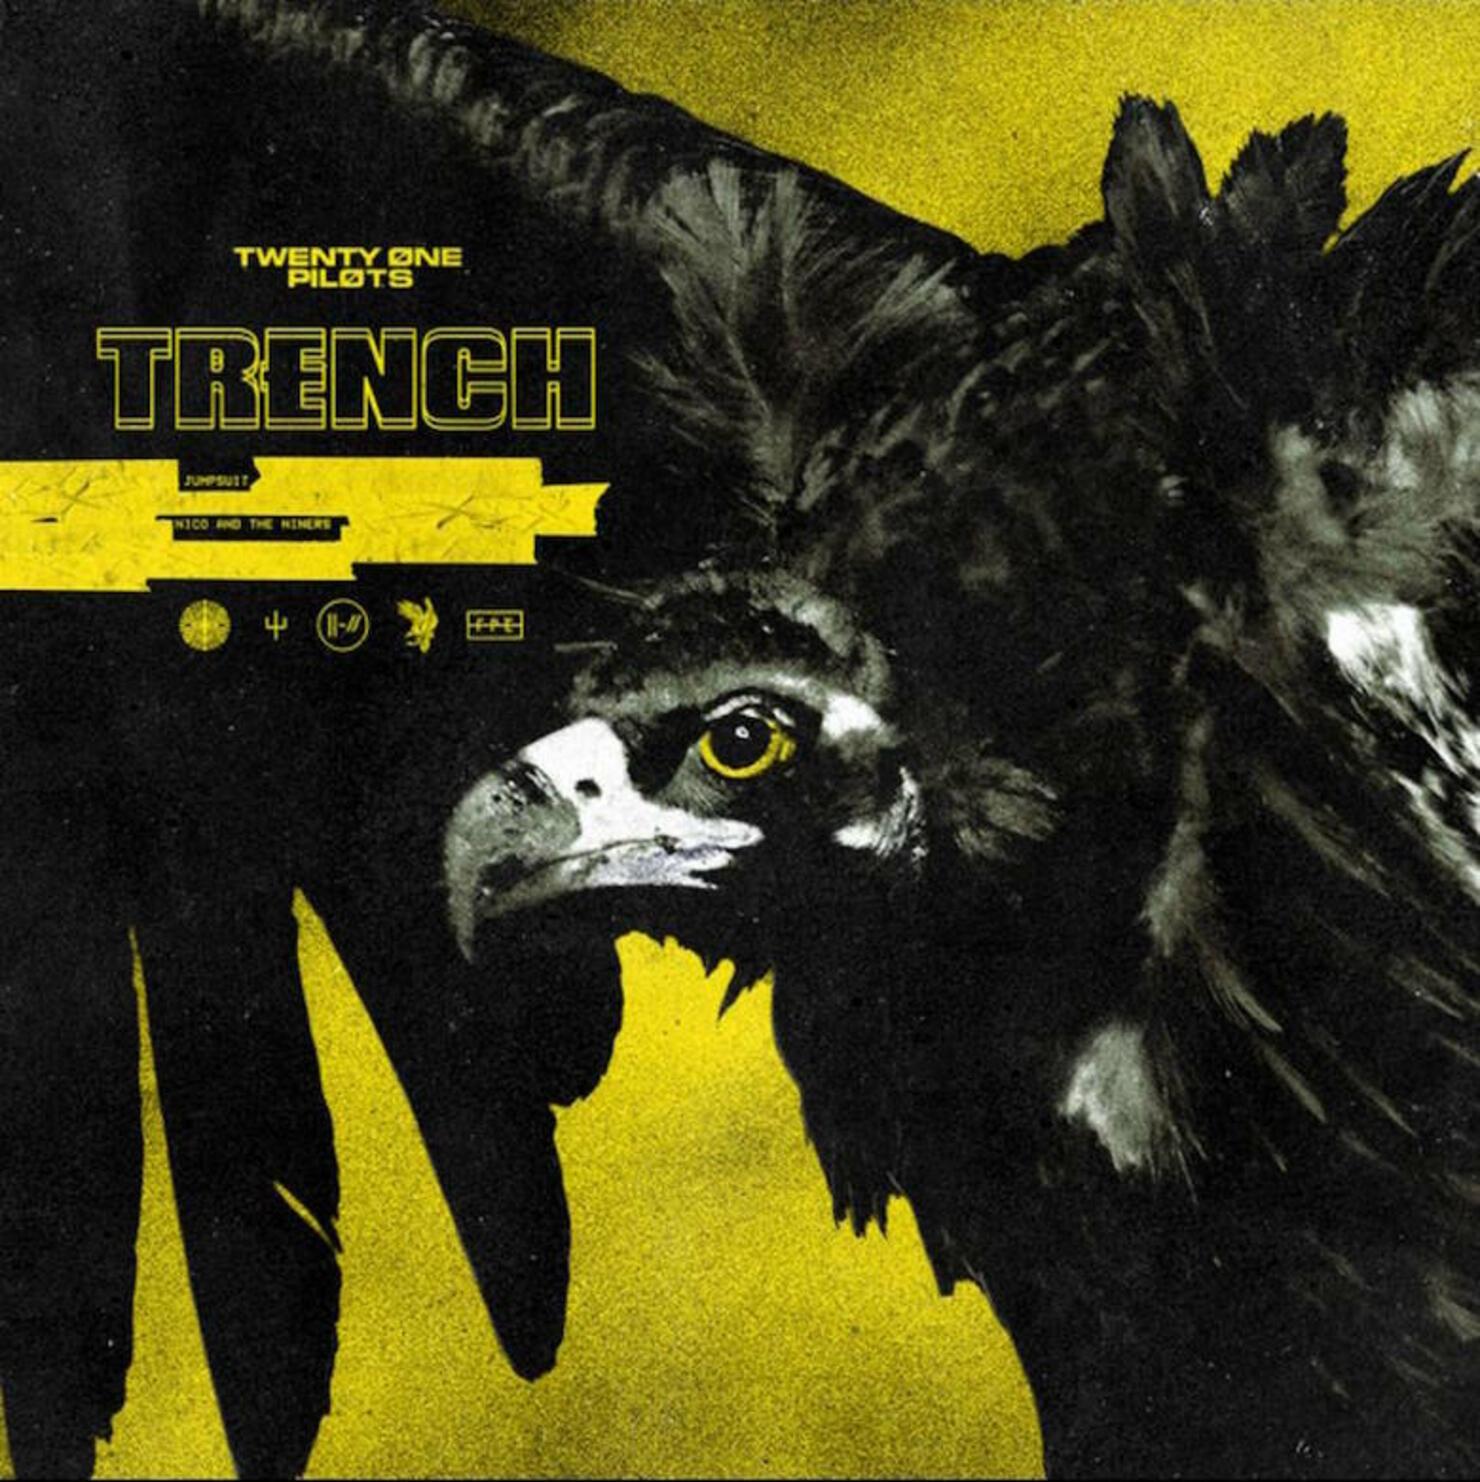 twenty one pilots - 'Trench' Album Cover Art